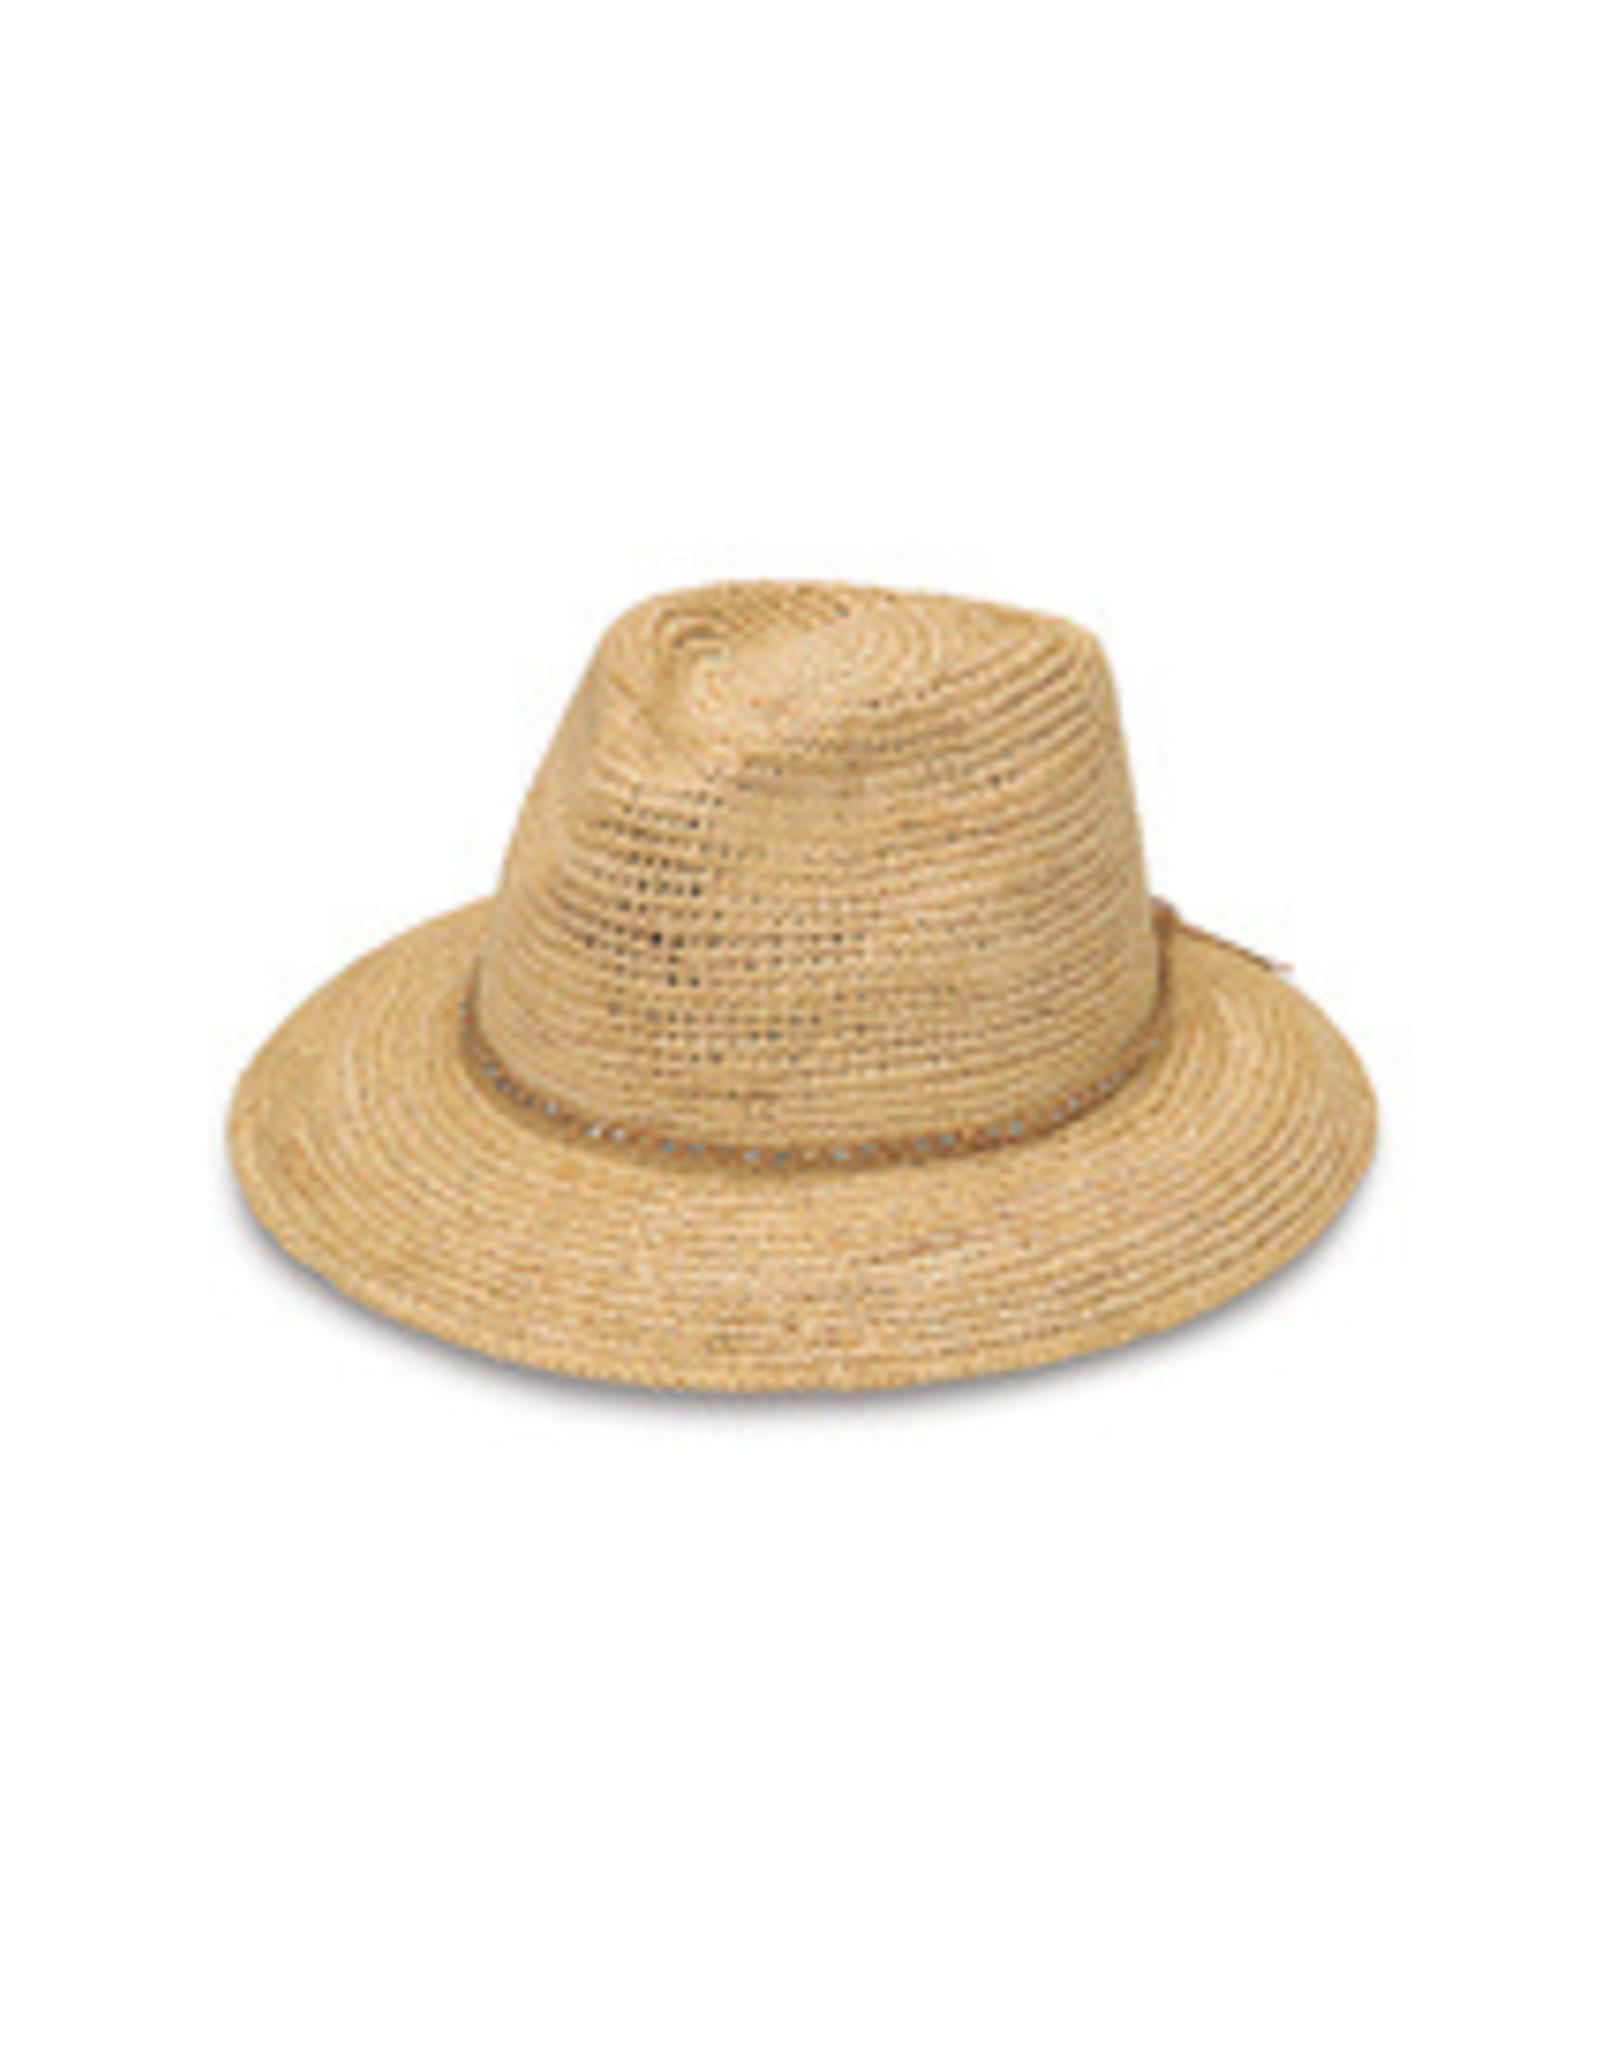 Wallaroo Hat Co Malibu- Natural